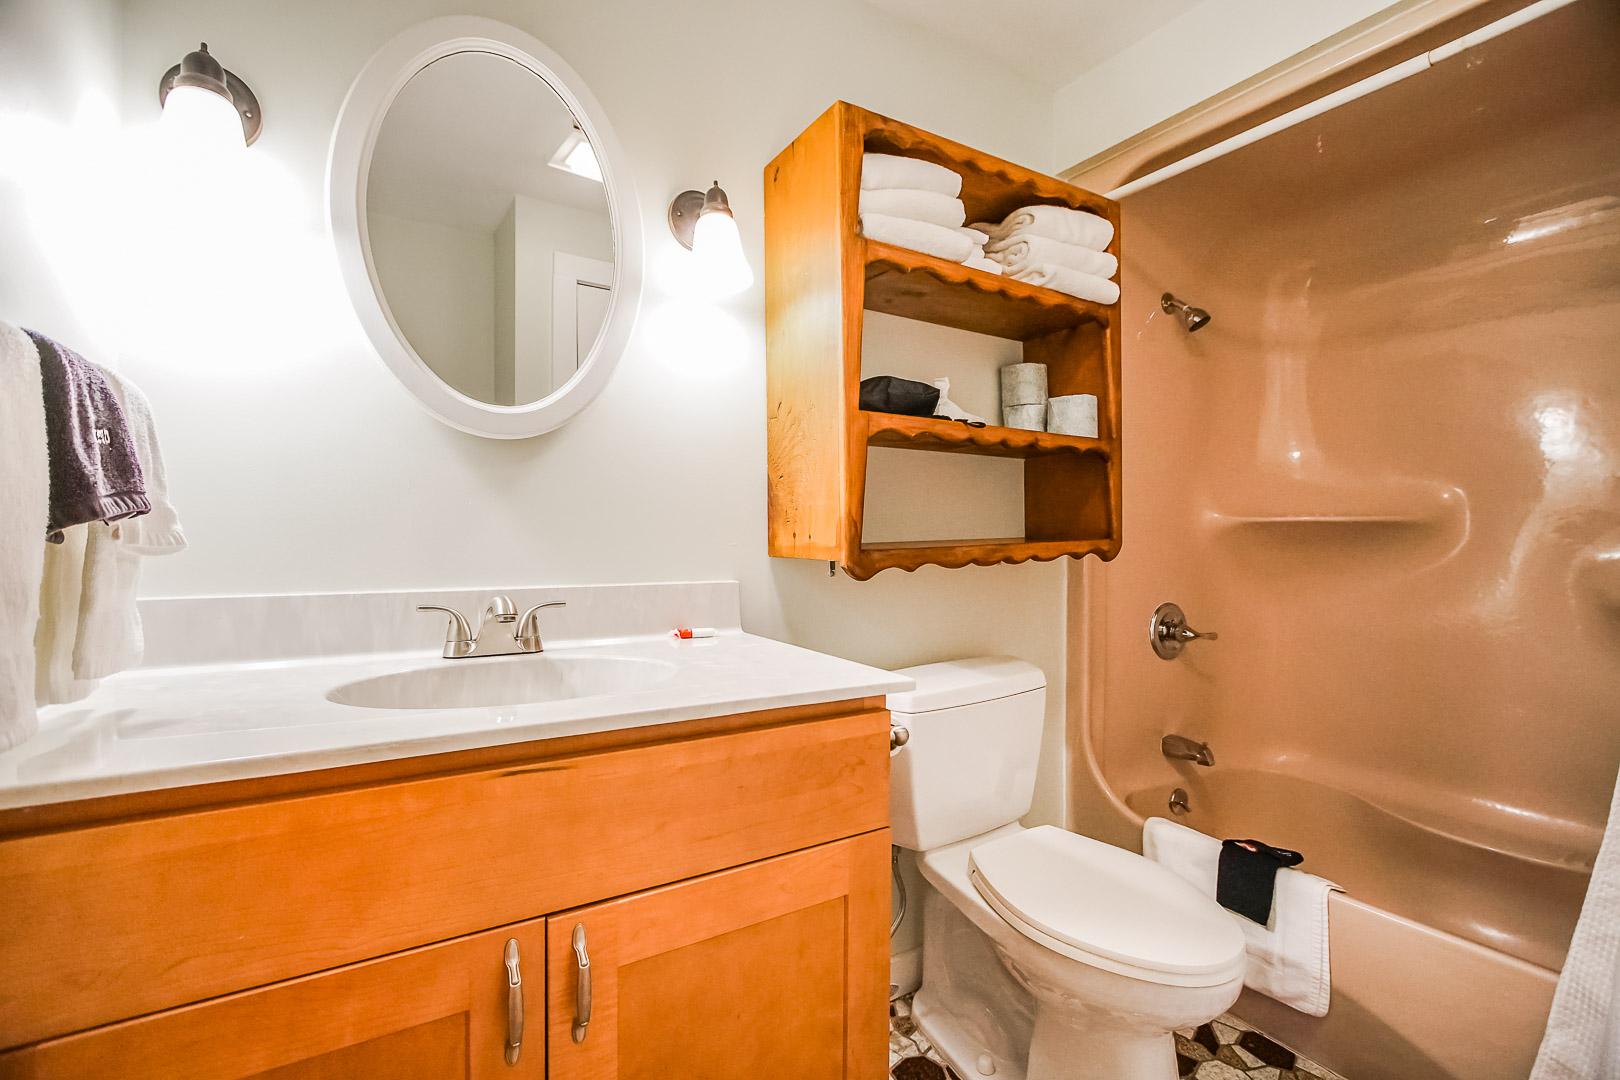 A clean bathroom at VRI's Neptune House Resort in Rhode Island.